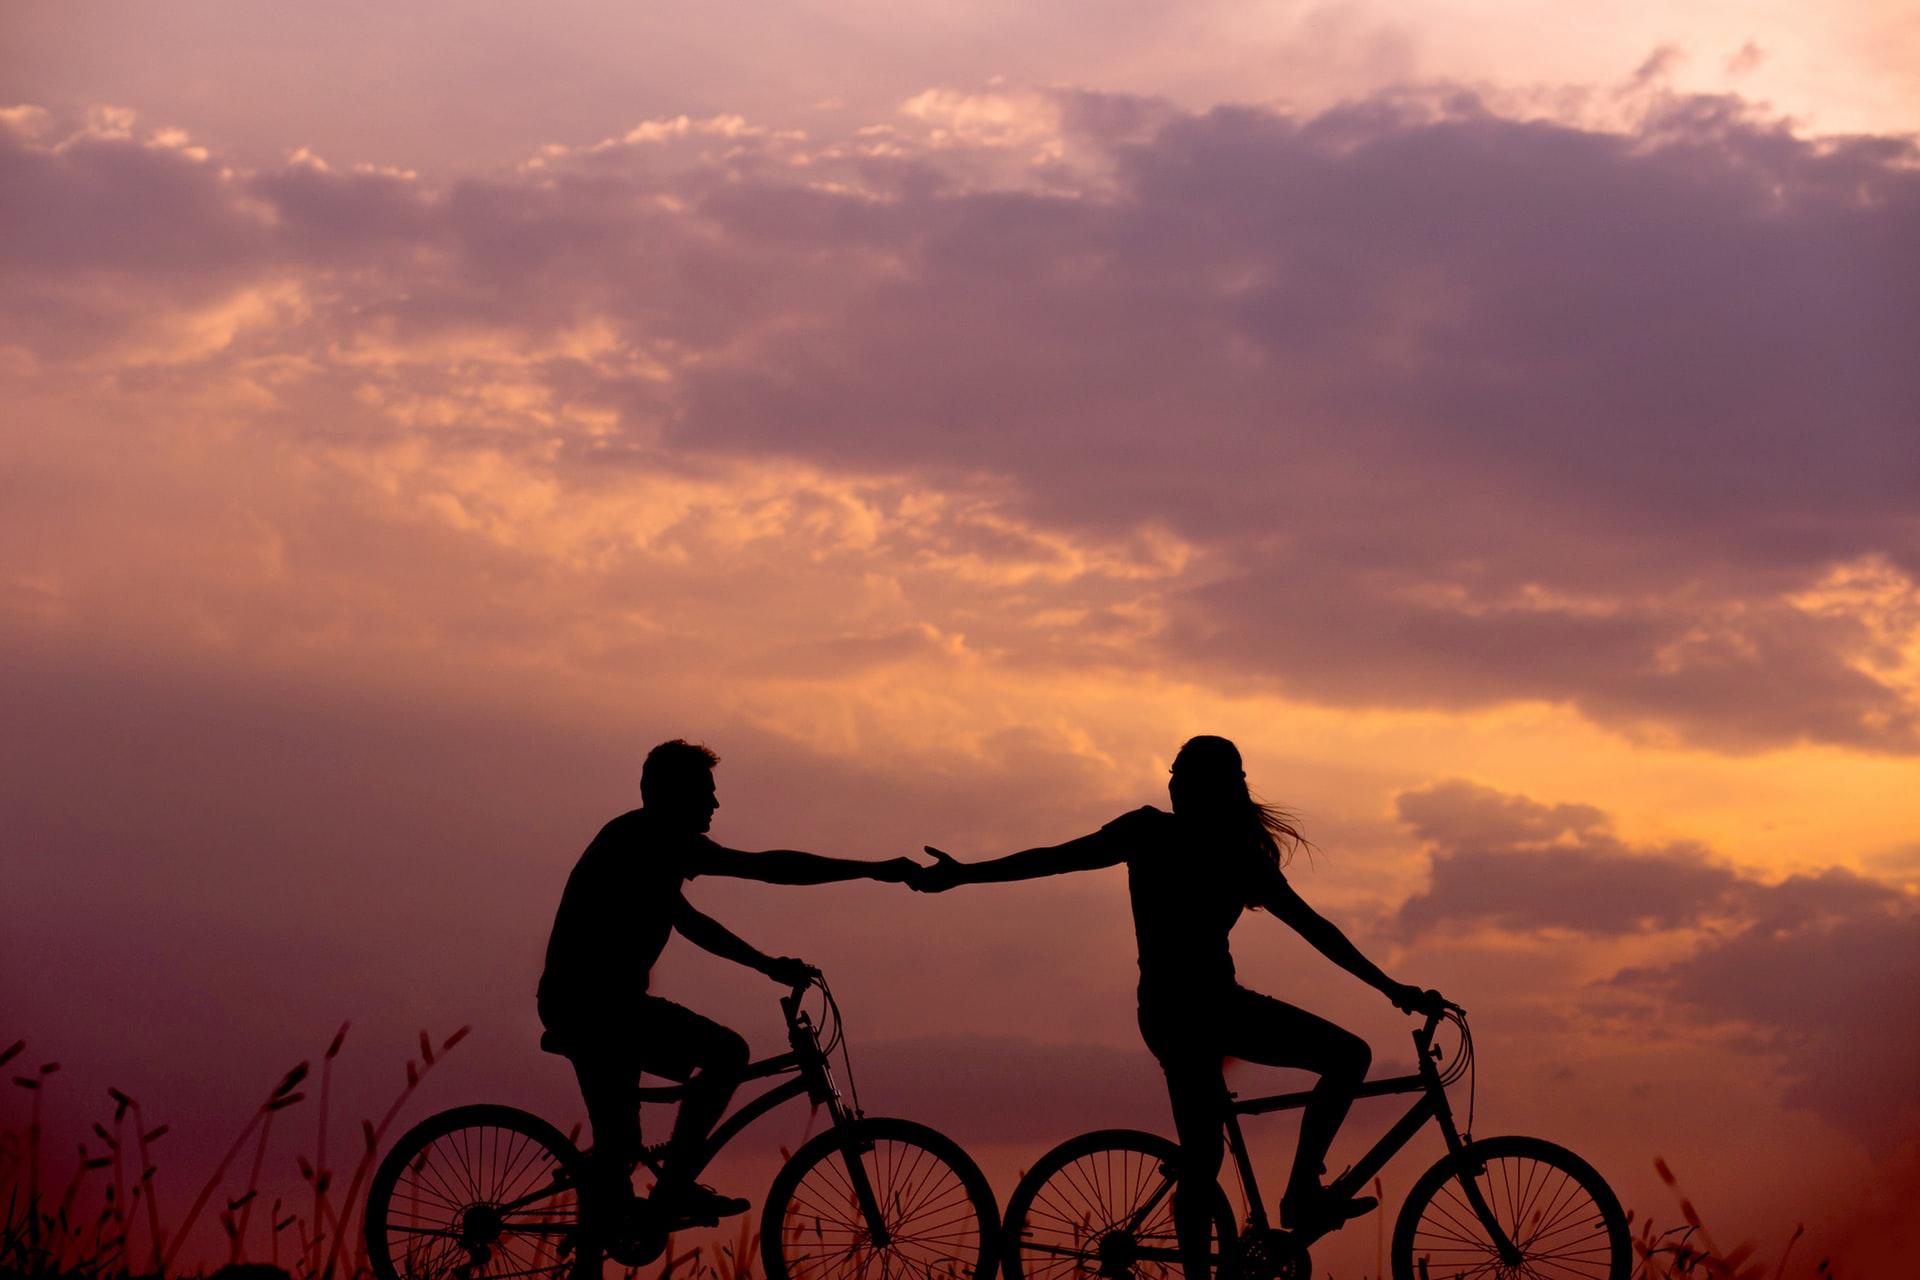 Casal a andar de bicicleta